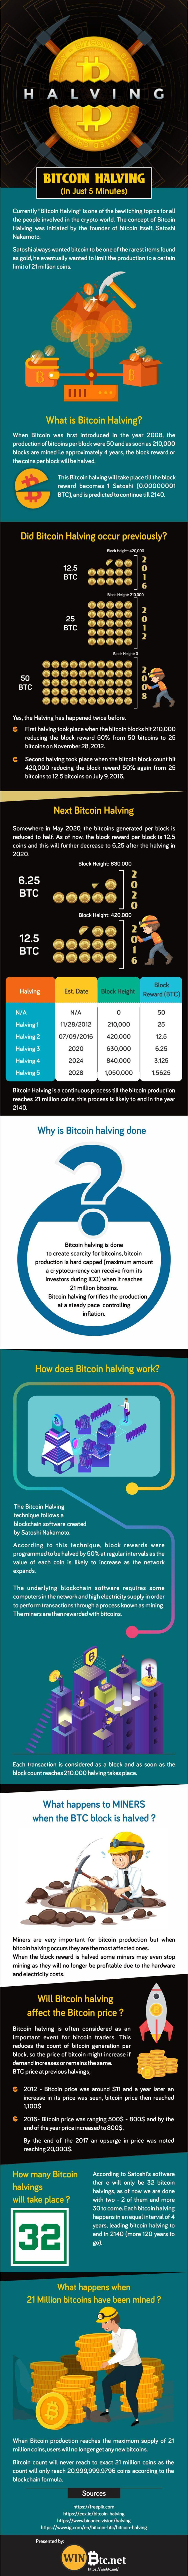 Bitcoin halving image